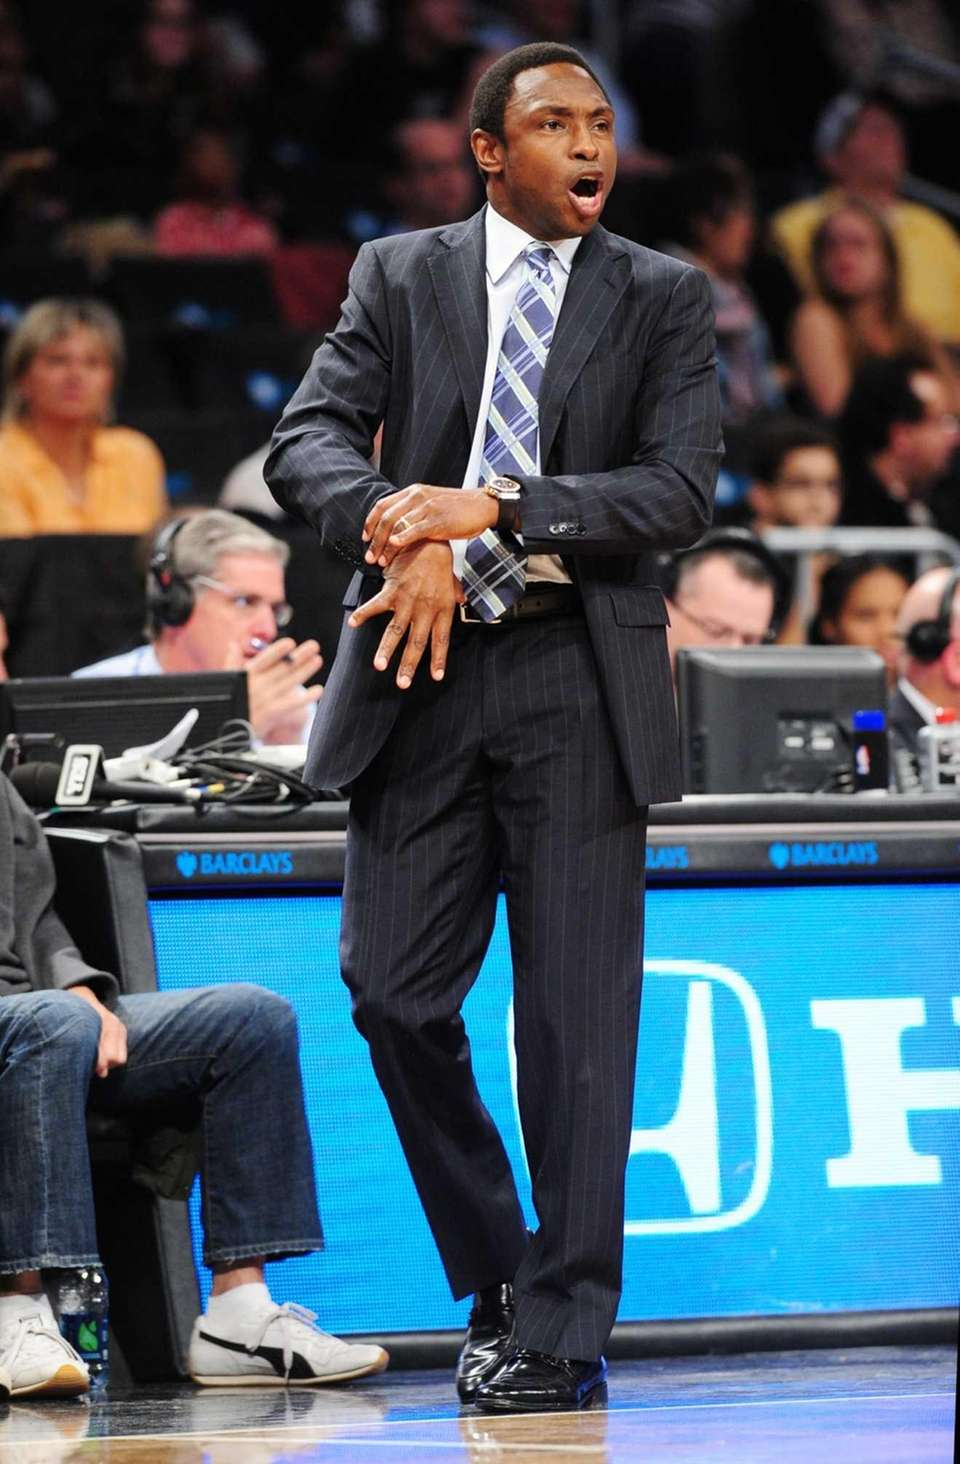 Brooklyn Nets head coach Avery Johnson calls out